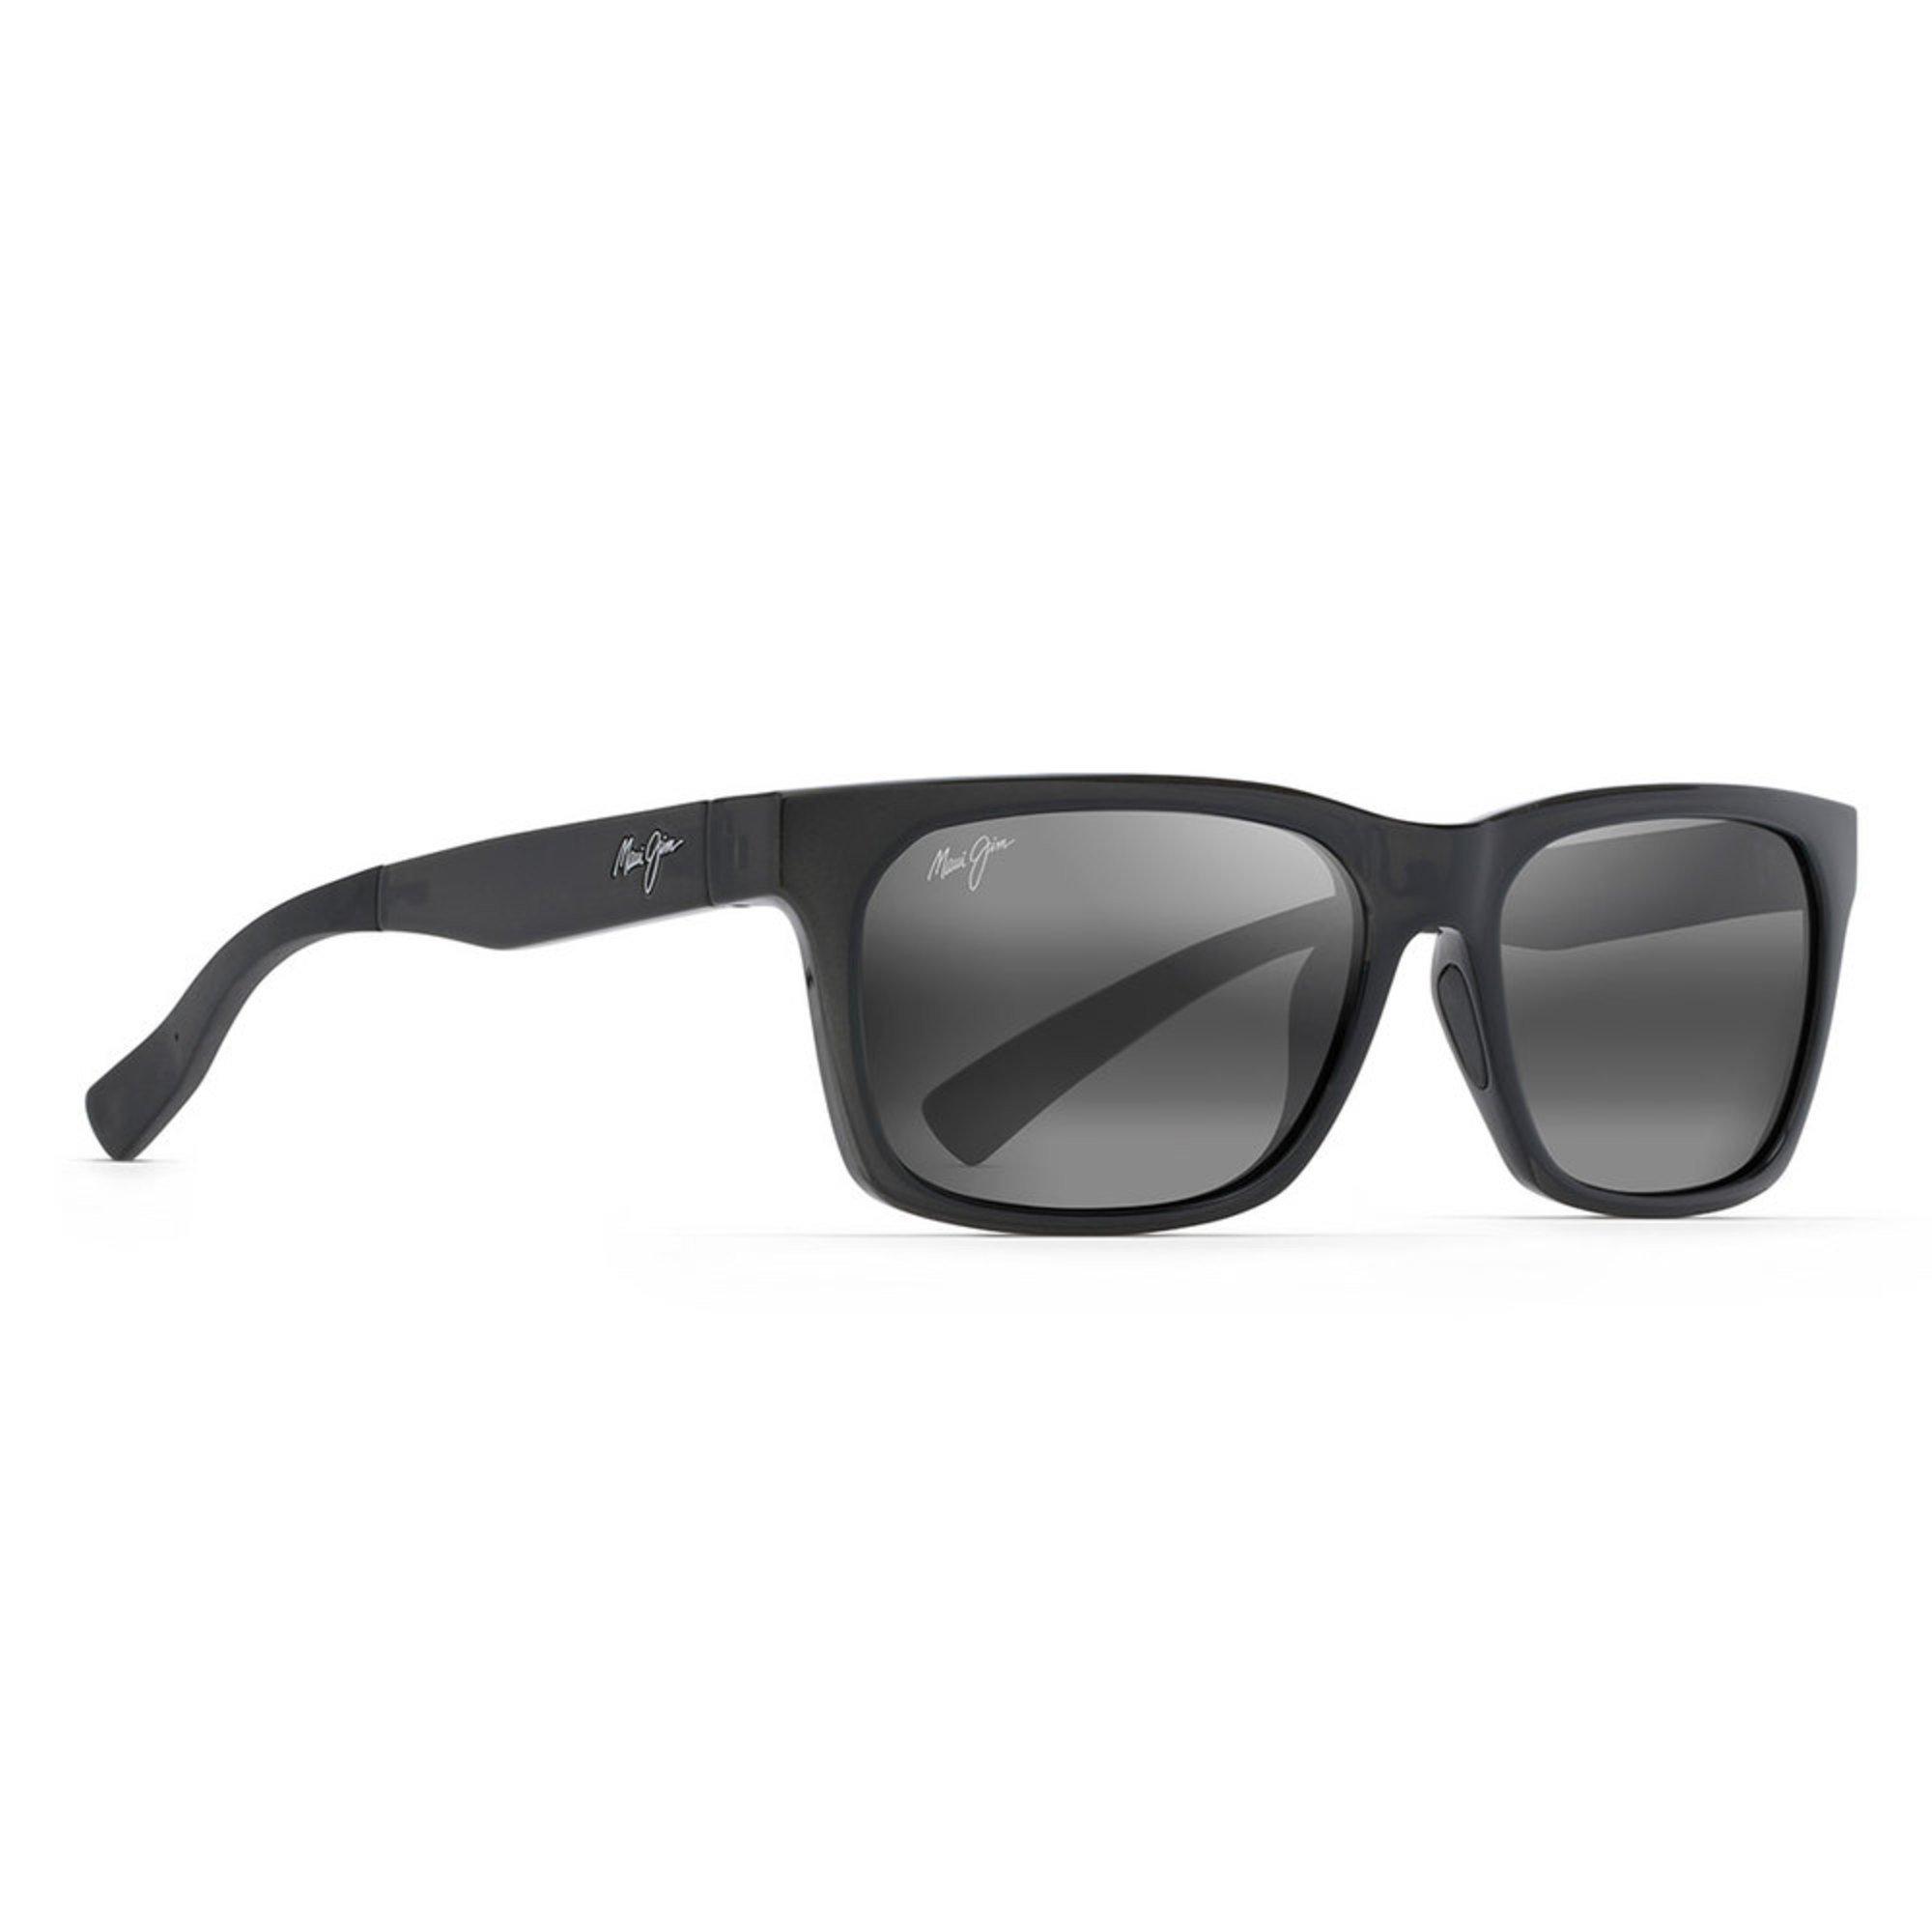 8362f9e423545 Maui Jim. Maui Jim Unisex Boardwalk Grey Sunglasses 56mm